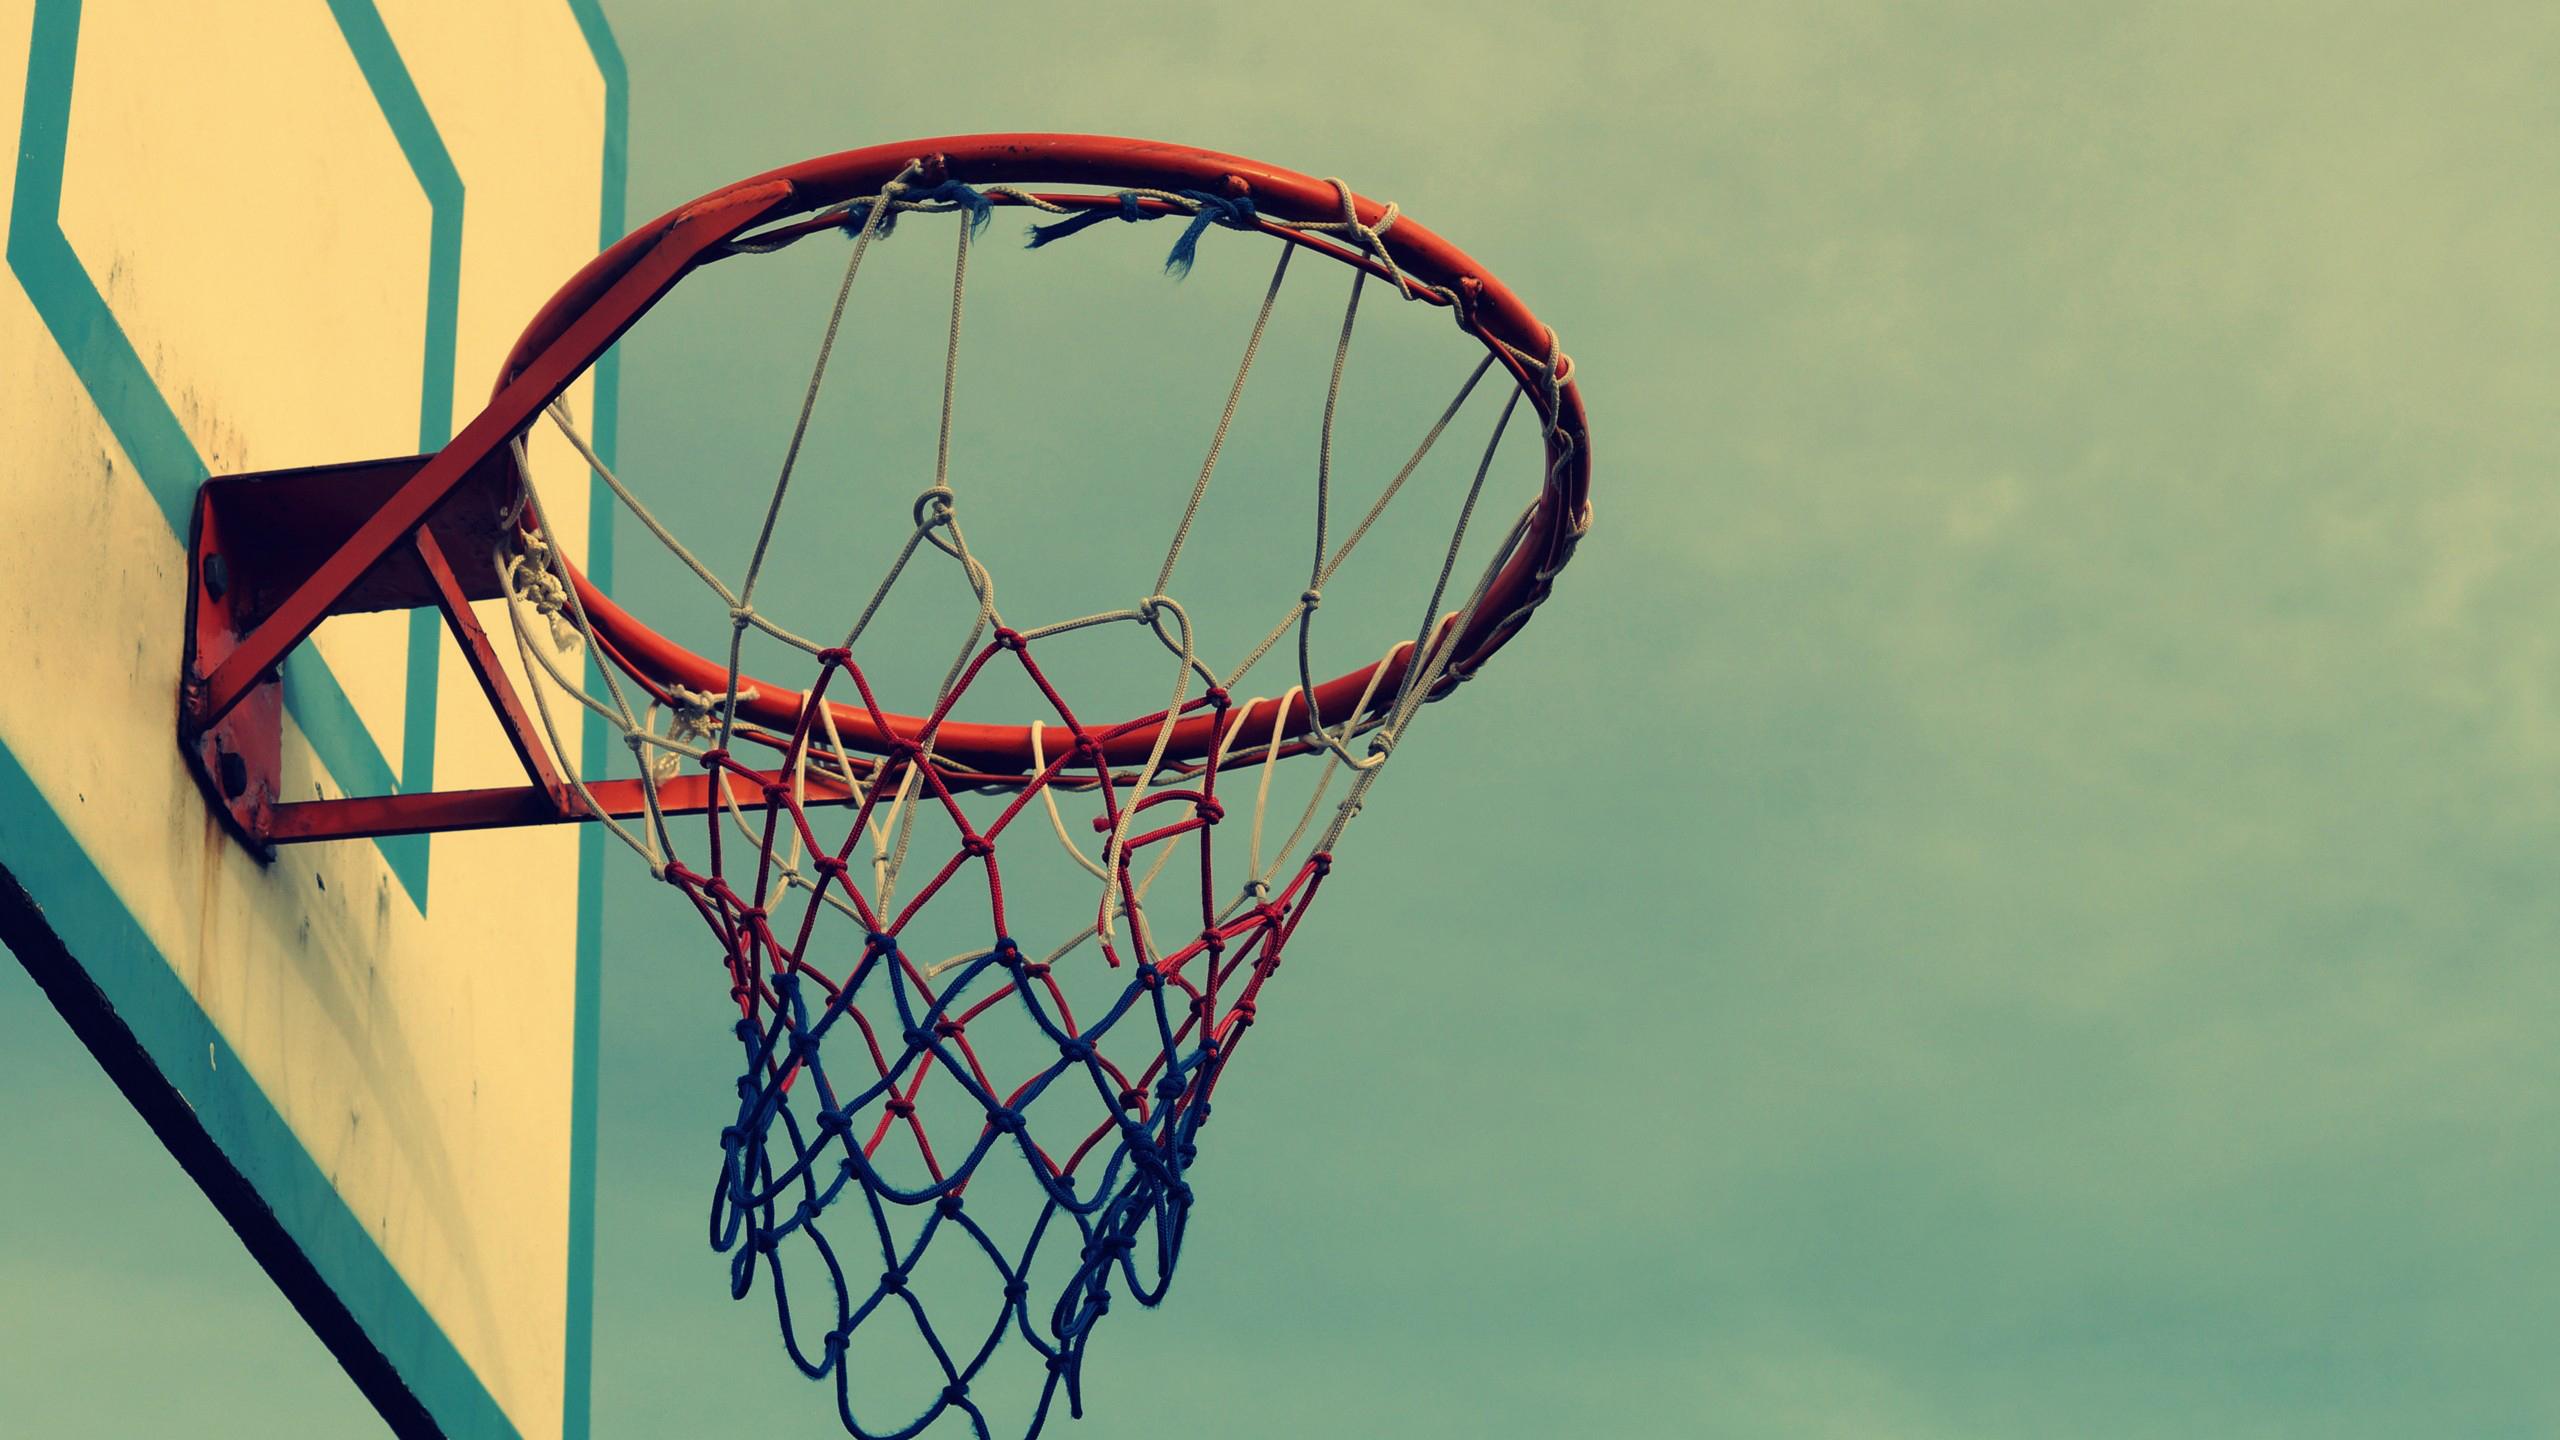 Sports - Basketball Wallpaper